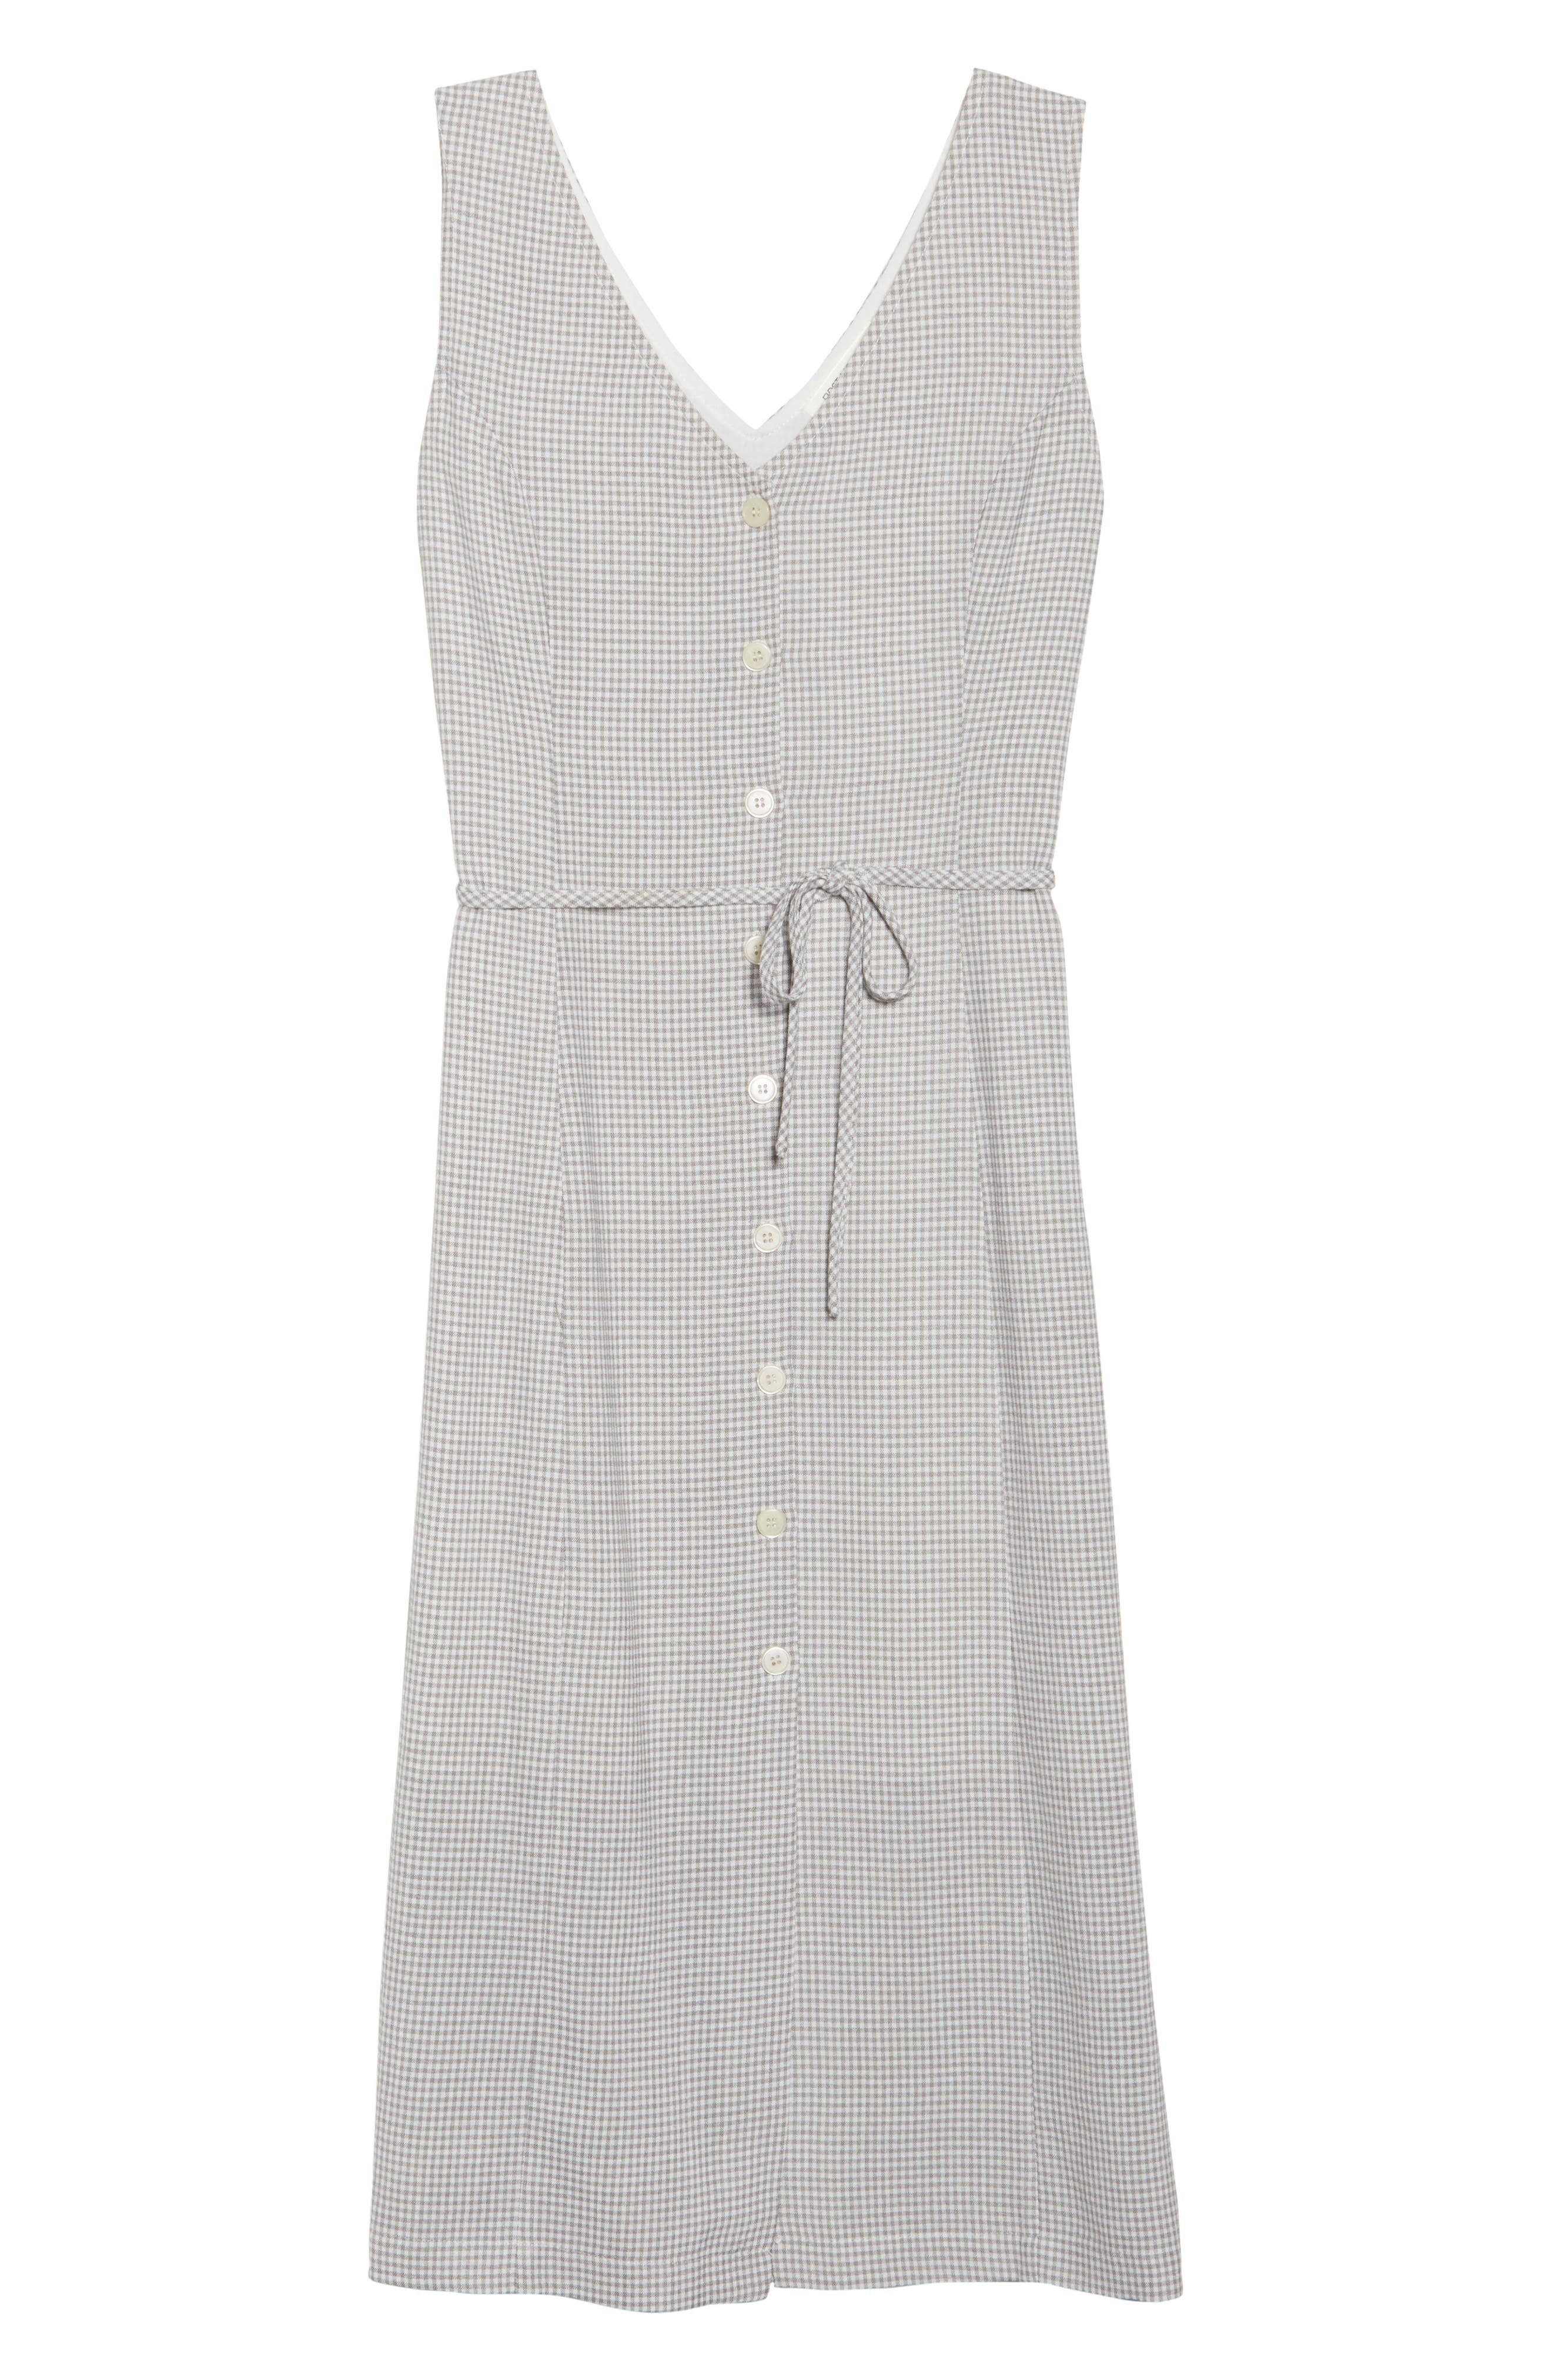 Gingham Midi Dress,                             Alternate thumbnail 7, color,                             Grey/ White